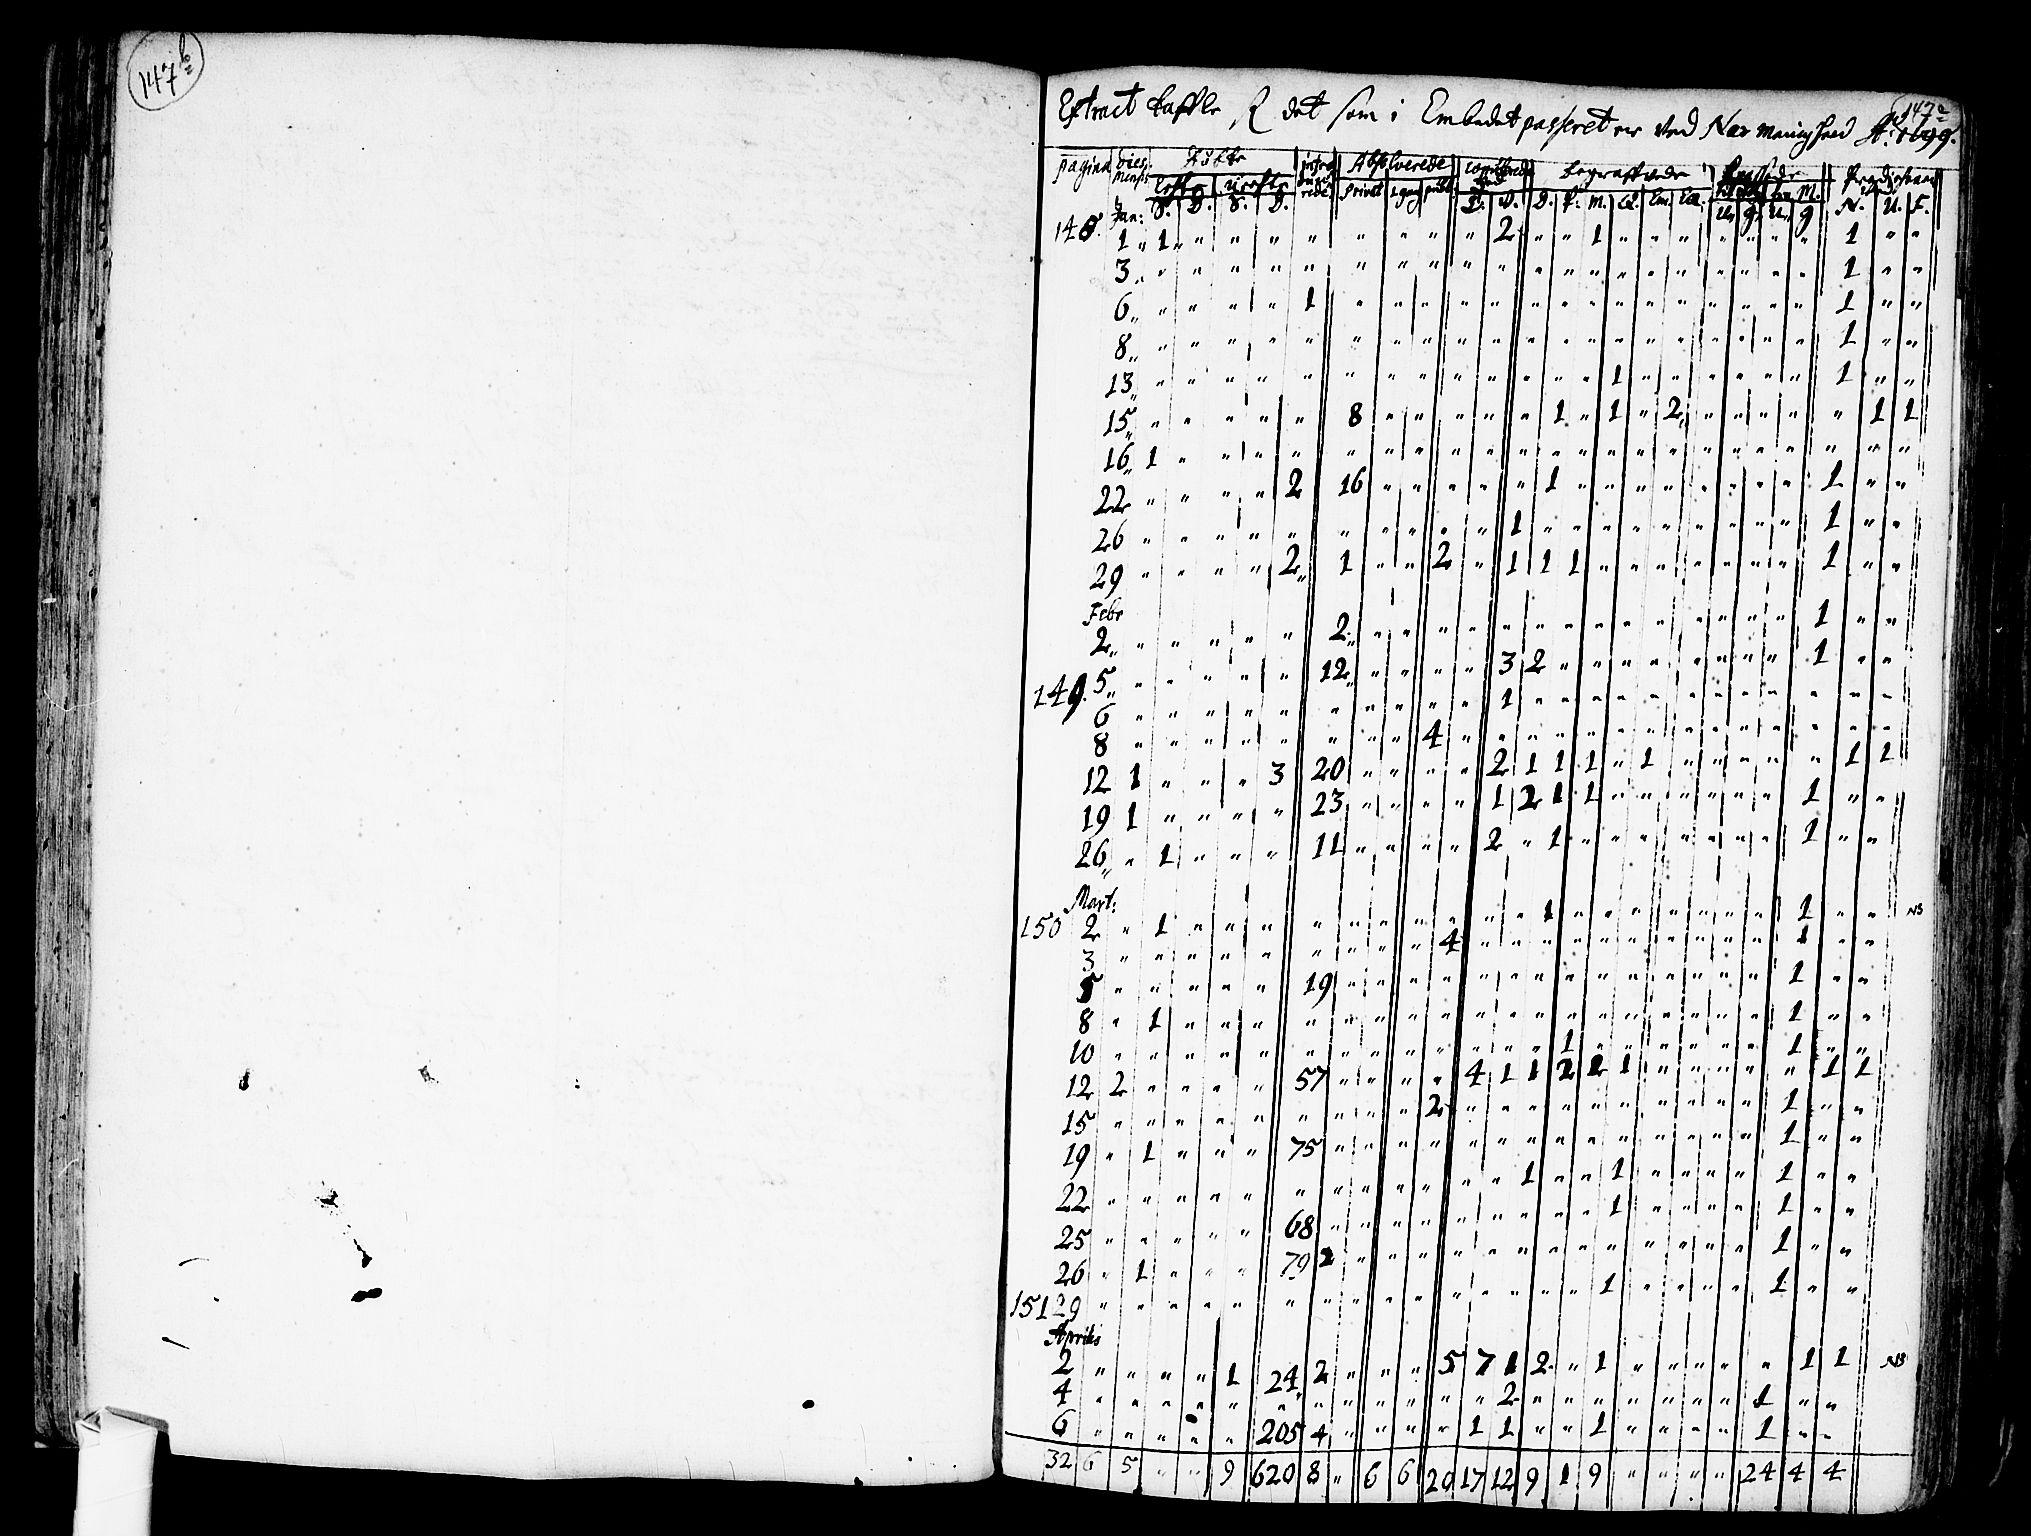 SAO, Nes prestekontor Kirkebøker, F/Fa/L0001: Parish register (official) no. I 1, 1689-1716, p. 147b-147c